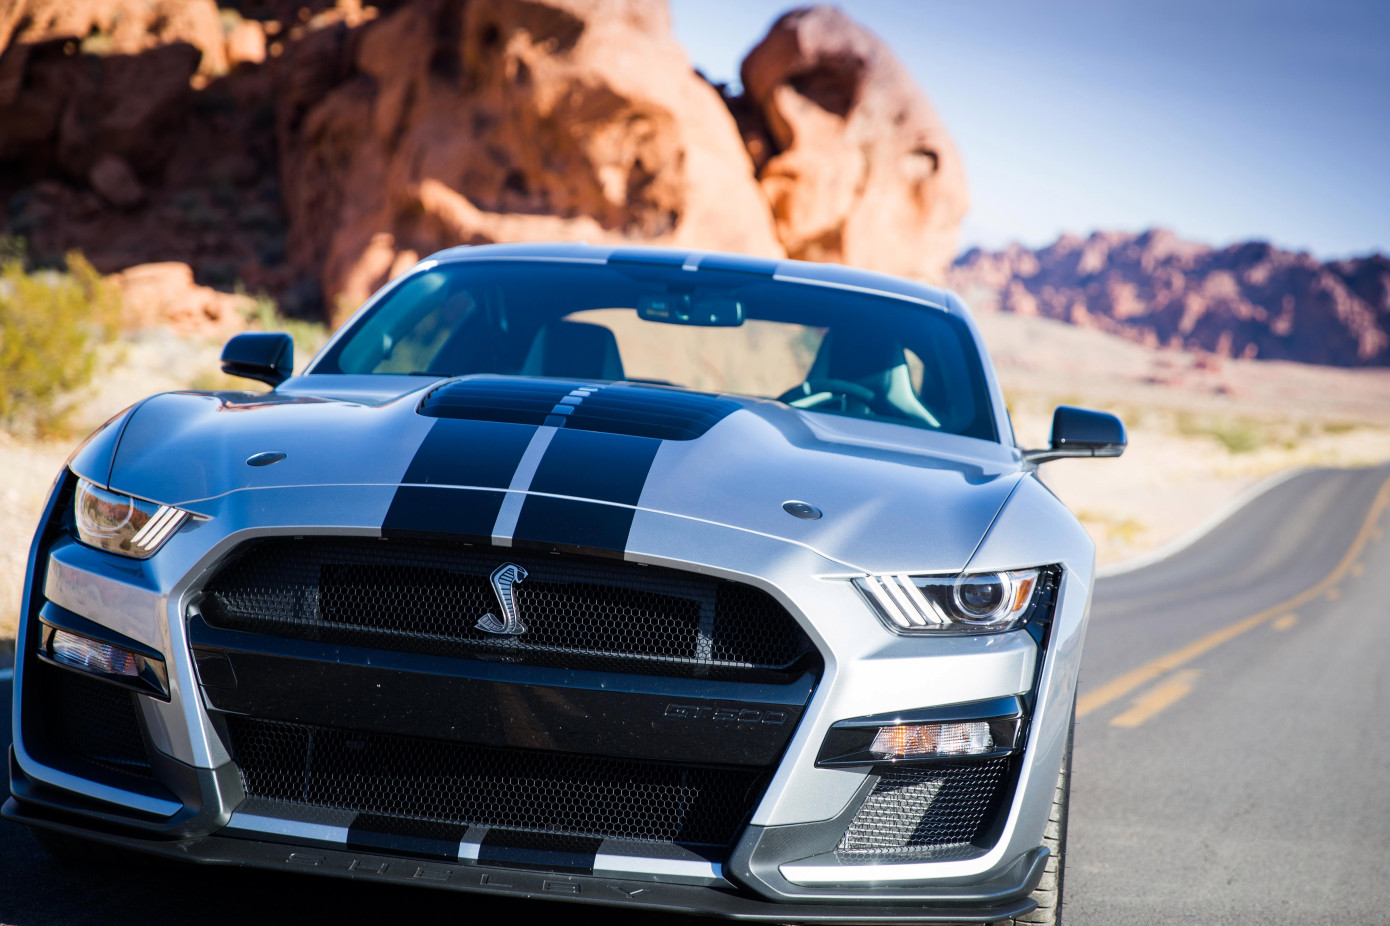 A 2020-as Ford ShelbyMustang egy vad autó a mindennapokba